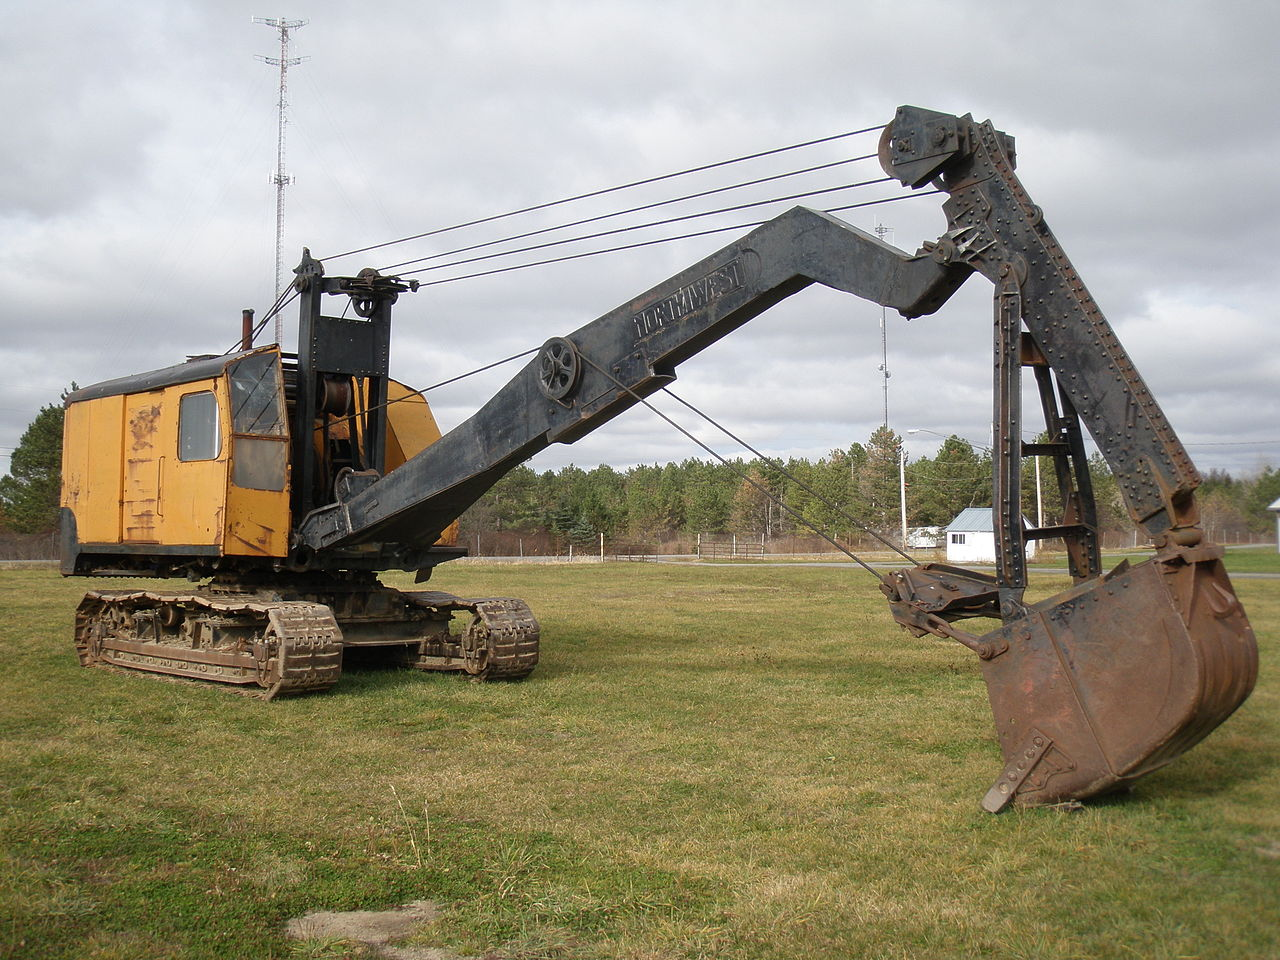 p&h mobile crane manual